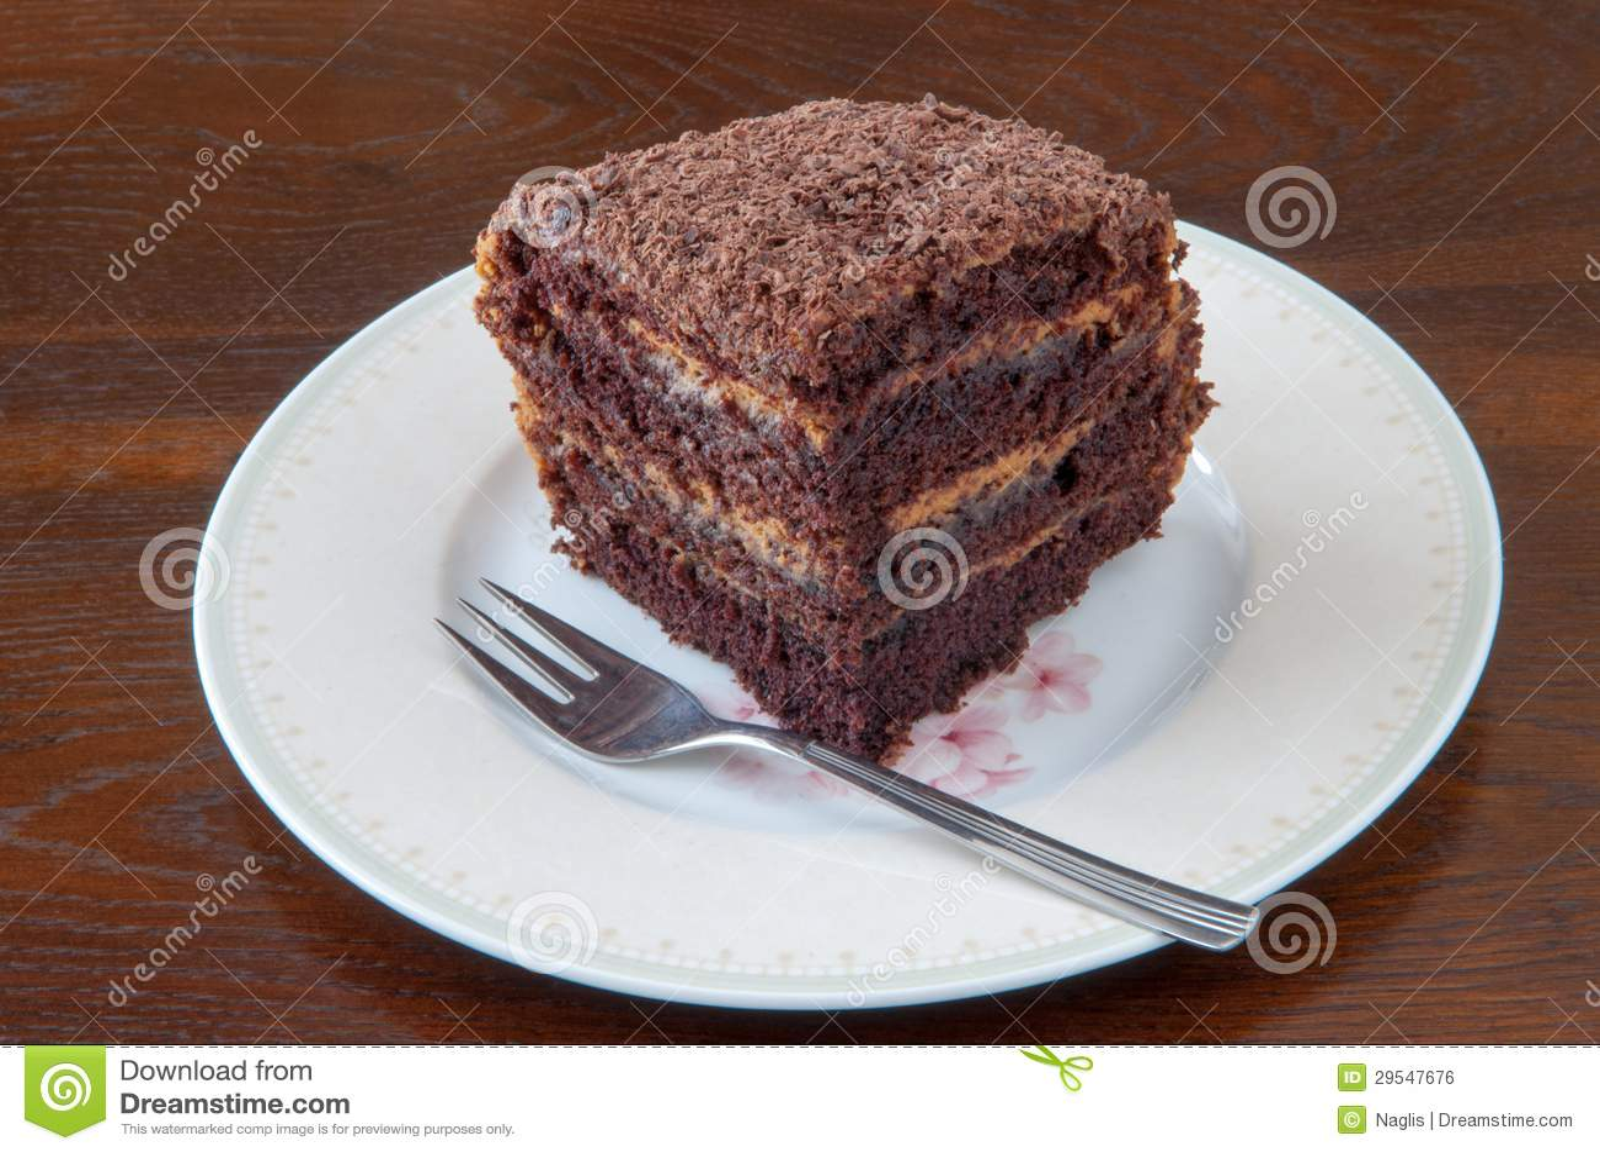 Dark Chocolate Cake II Royalty Free Stock Image - Image: 29547676